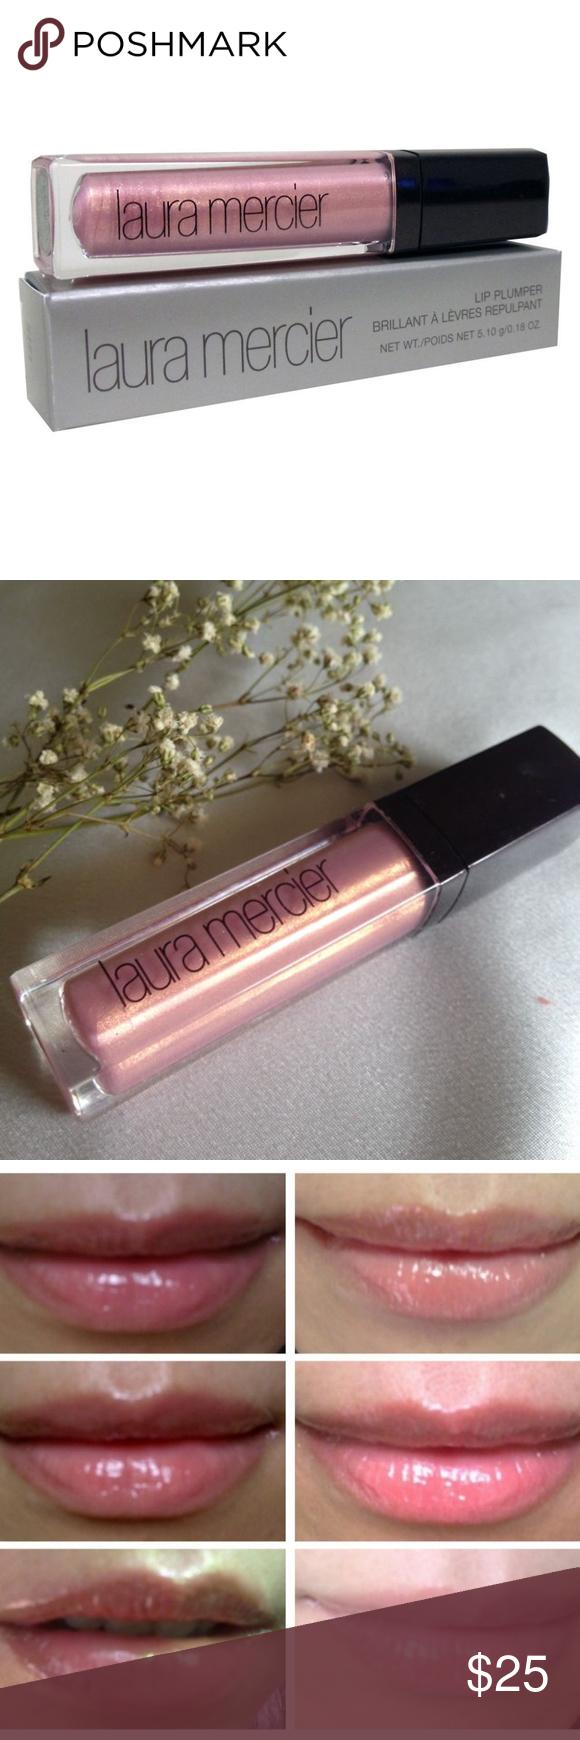 Laura Mercier Lip Plumper Gloss Pink Pearl New Plumping Lip Gloss Lip Plumper Pink Pearl